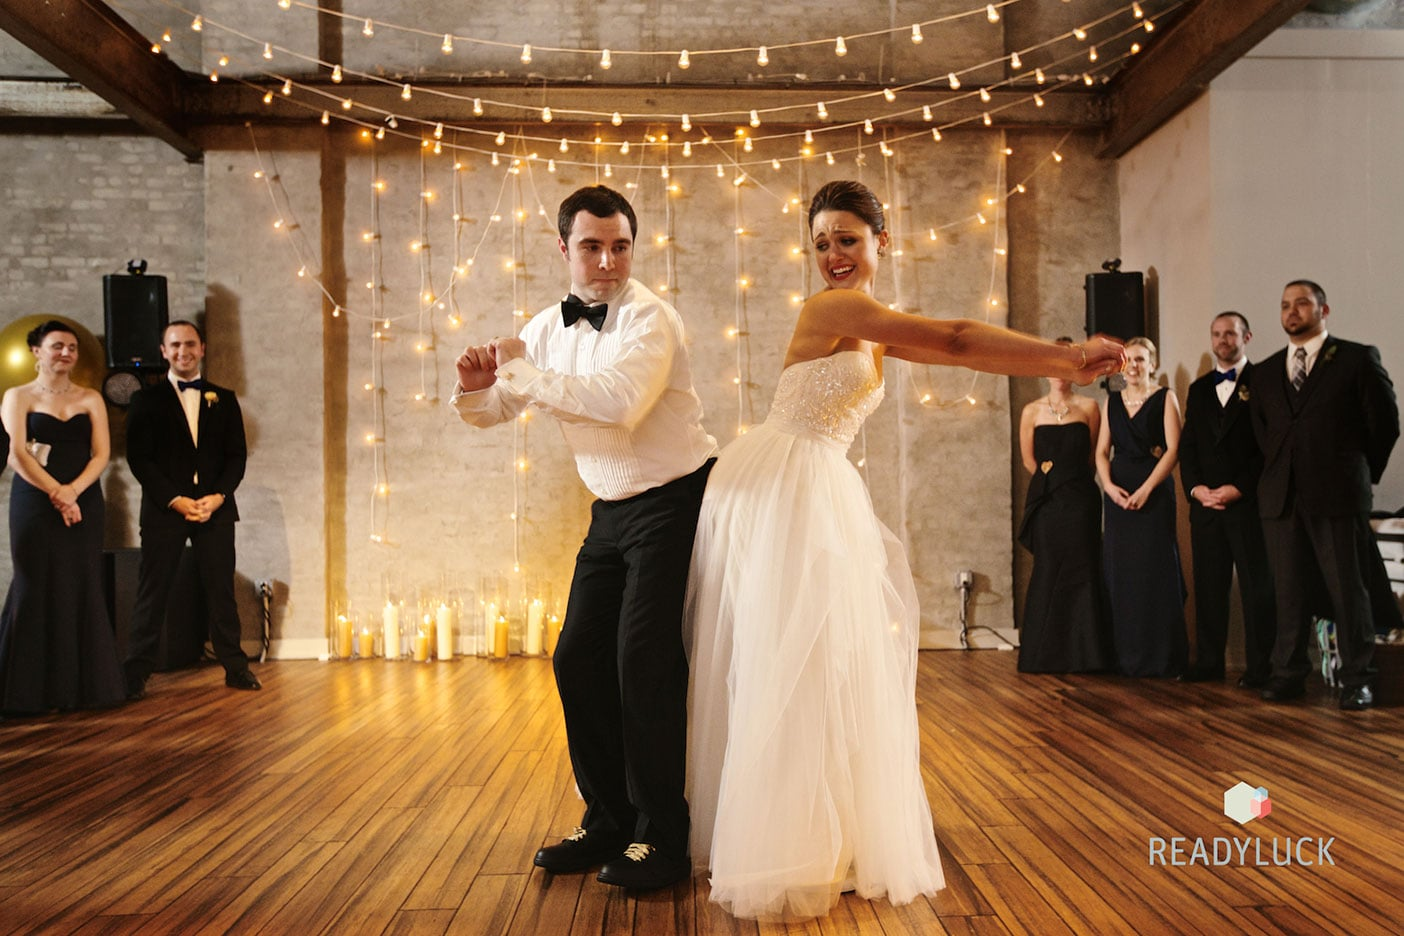 Industrial warehouse wedding in Fishtown Philadelphia at Front & Palmer | Wedding planner & wedding design: Heart & Dash | Photo: Readyluck | Flowers: Vault + Vine